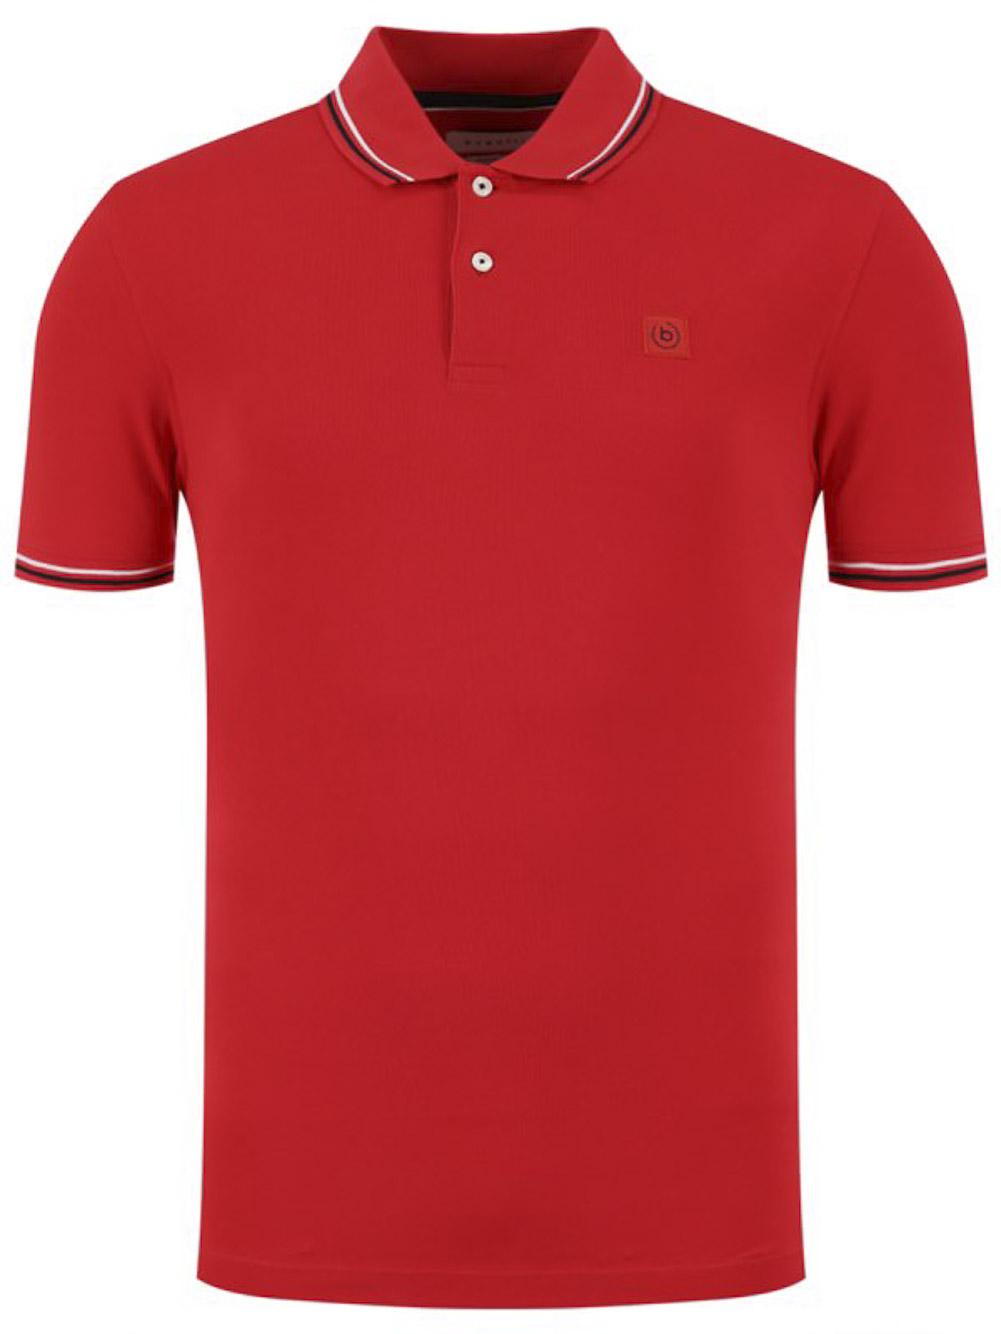 BUGATTI Μπλούζα Polo 8150 55001-950 ΚΟΚΚΙΝΟ